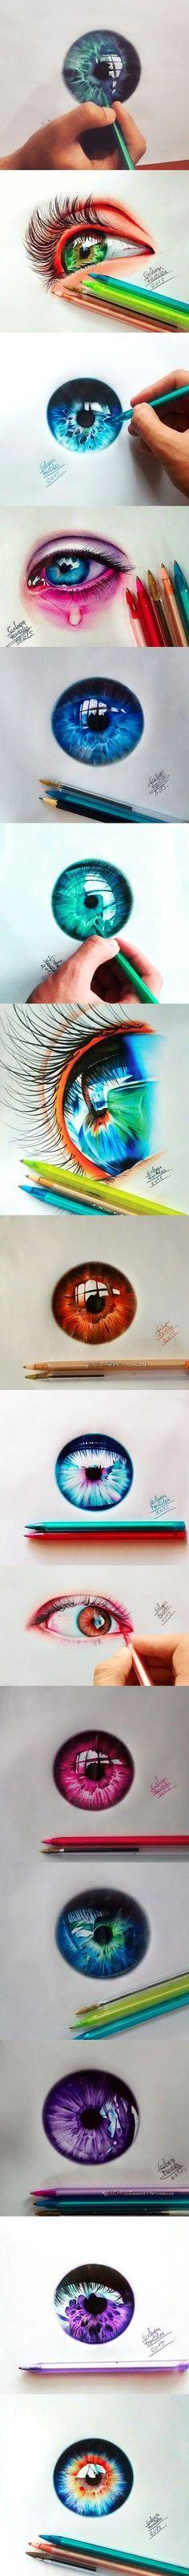 Fascinating Eyes Colors Drawing #RealisticDrawings